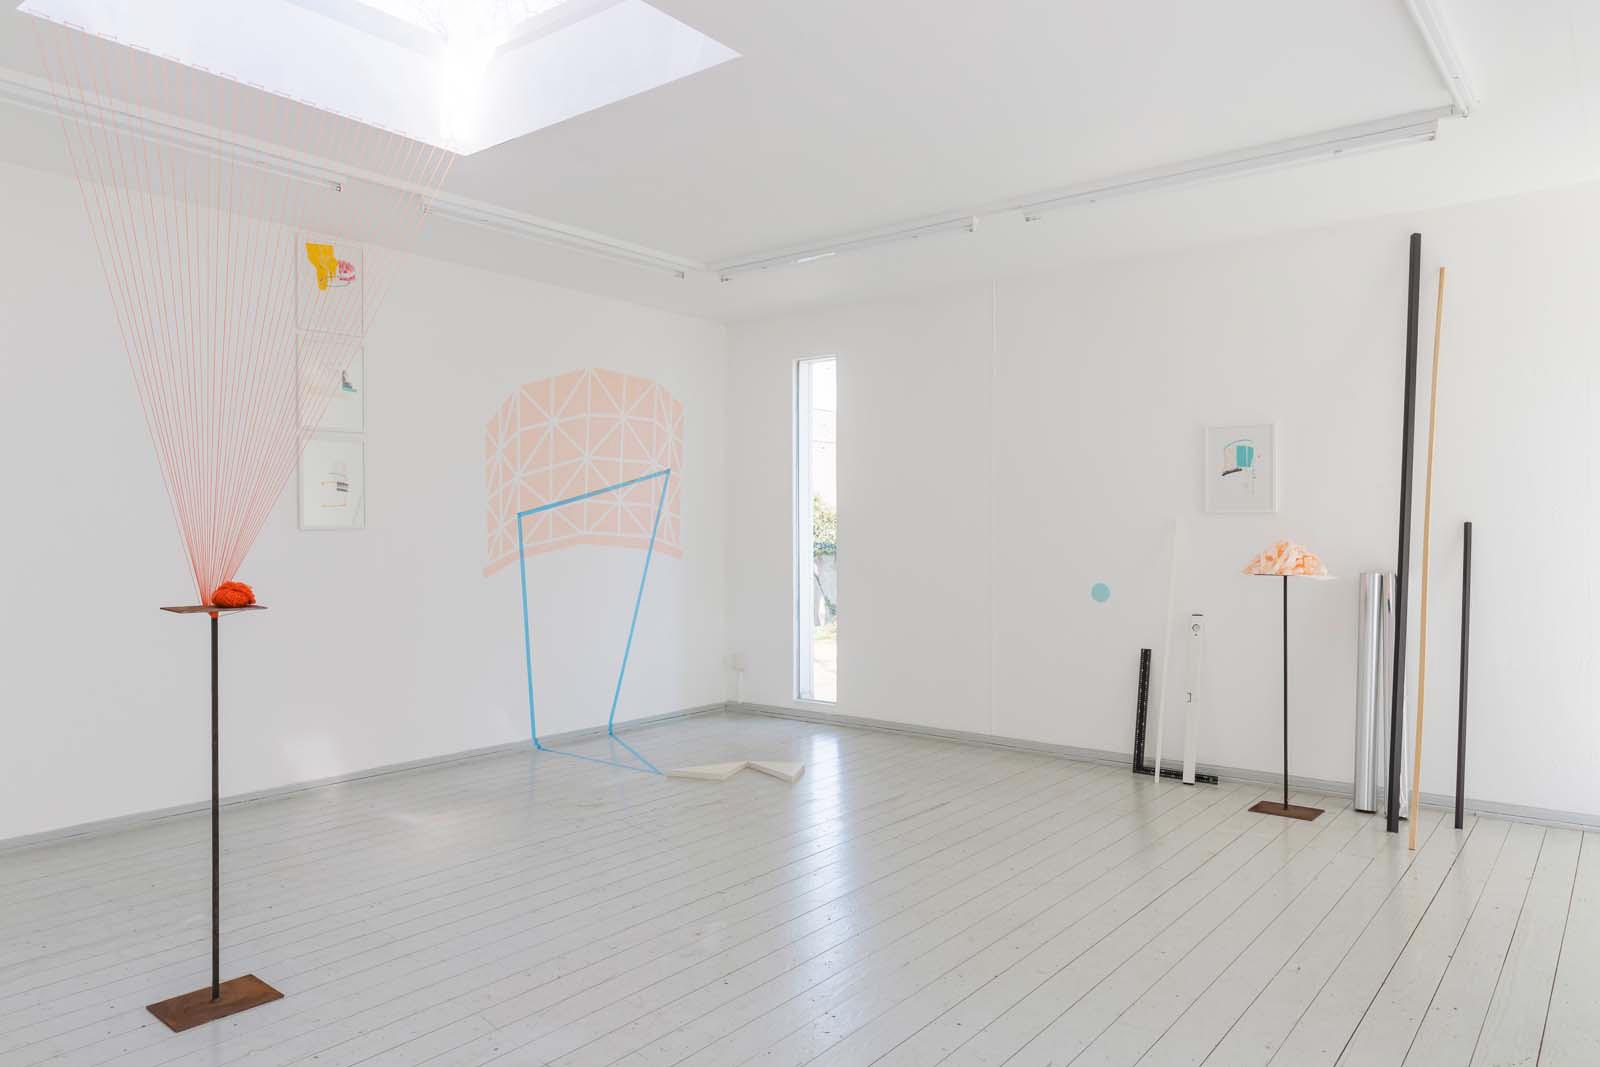 Marta Colombo Junge Museum 2016